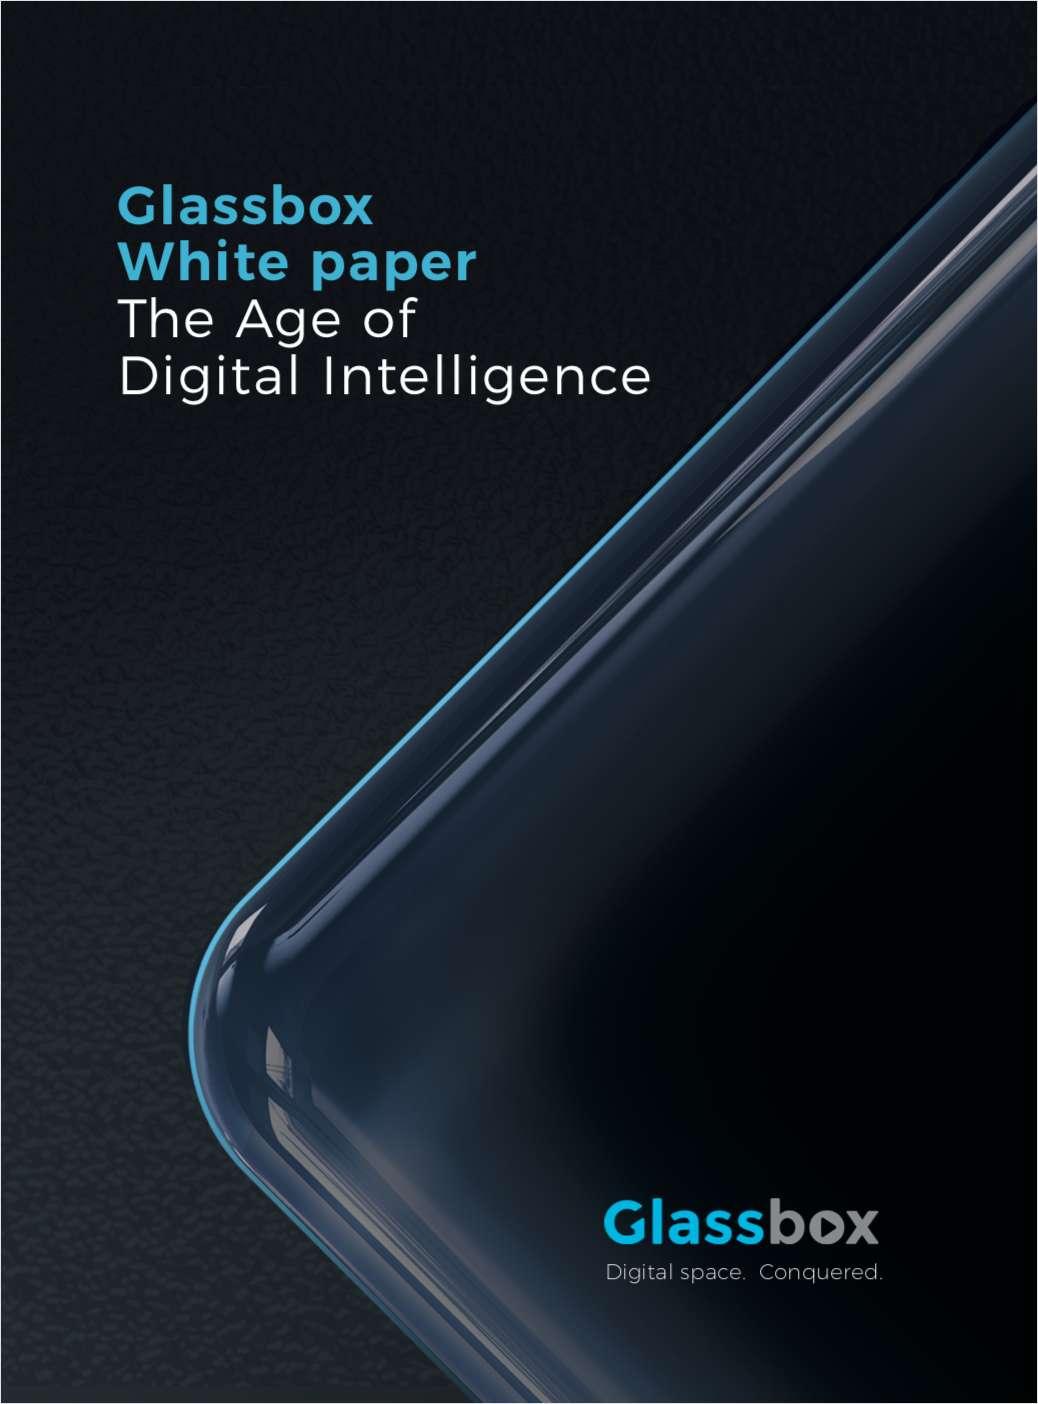 The Age of Digital Intelligence